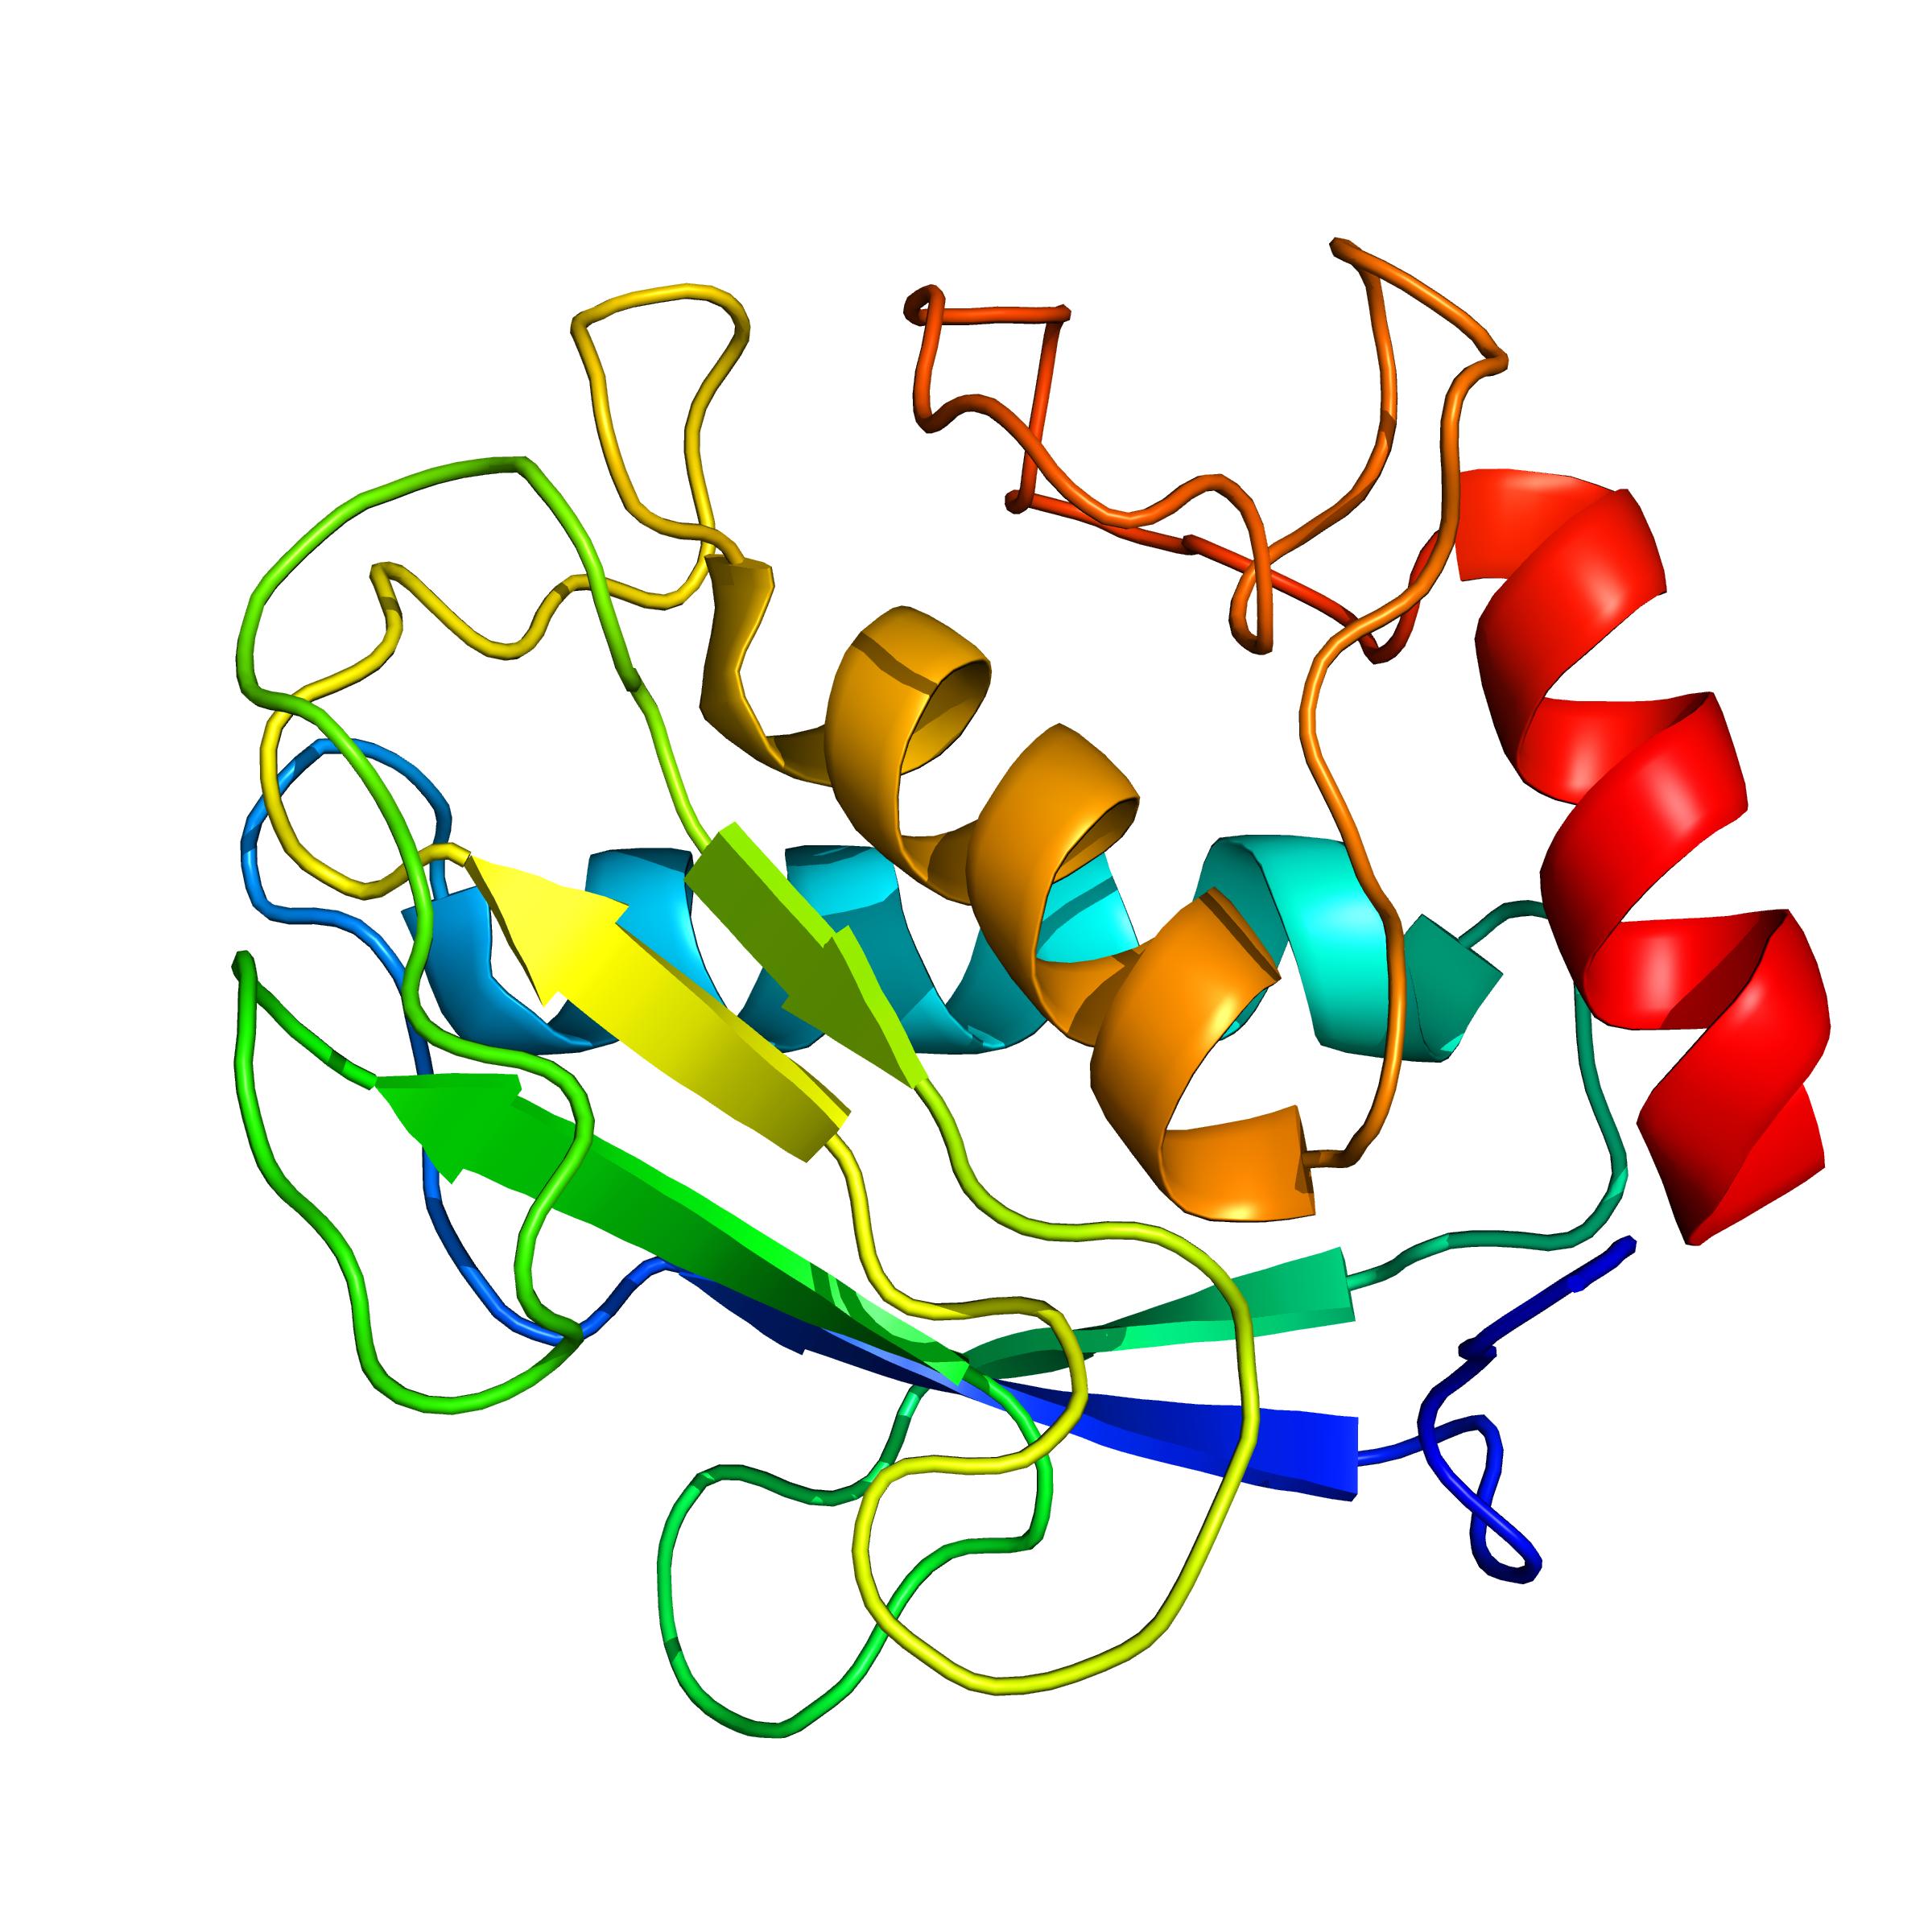 mmp8 | protein custum service Giotto biotech